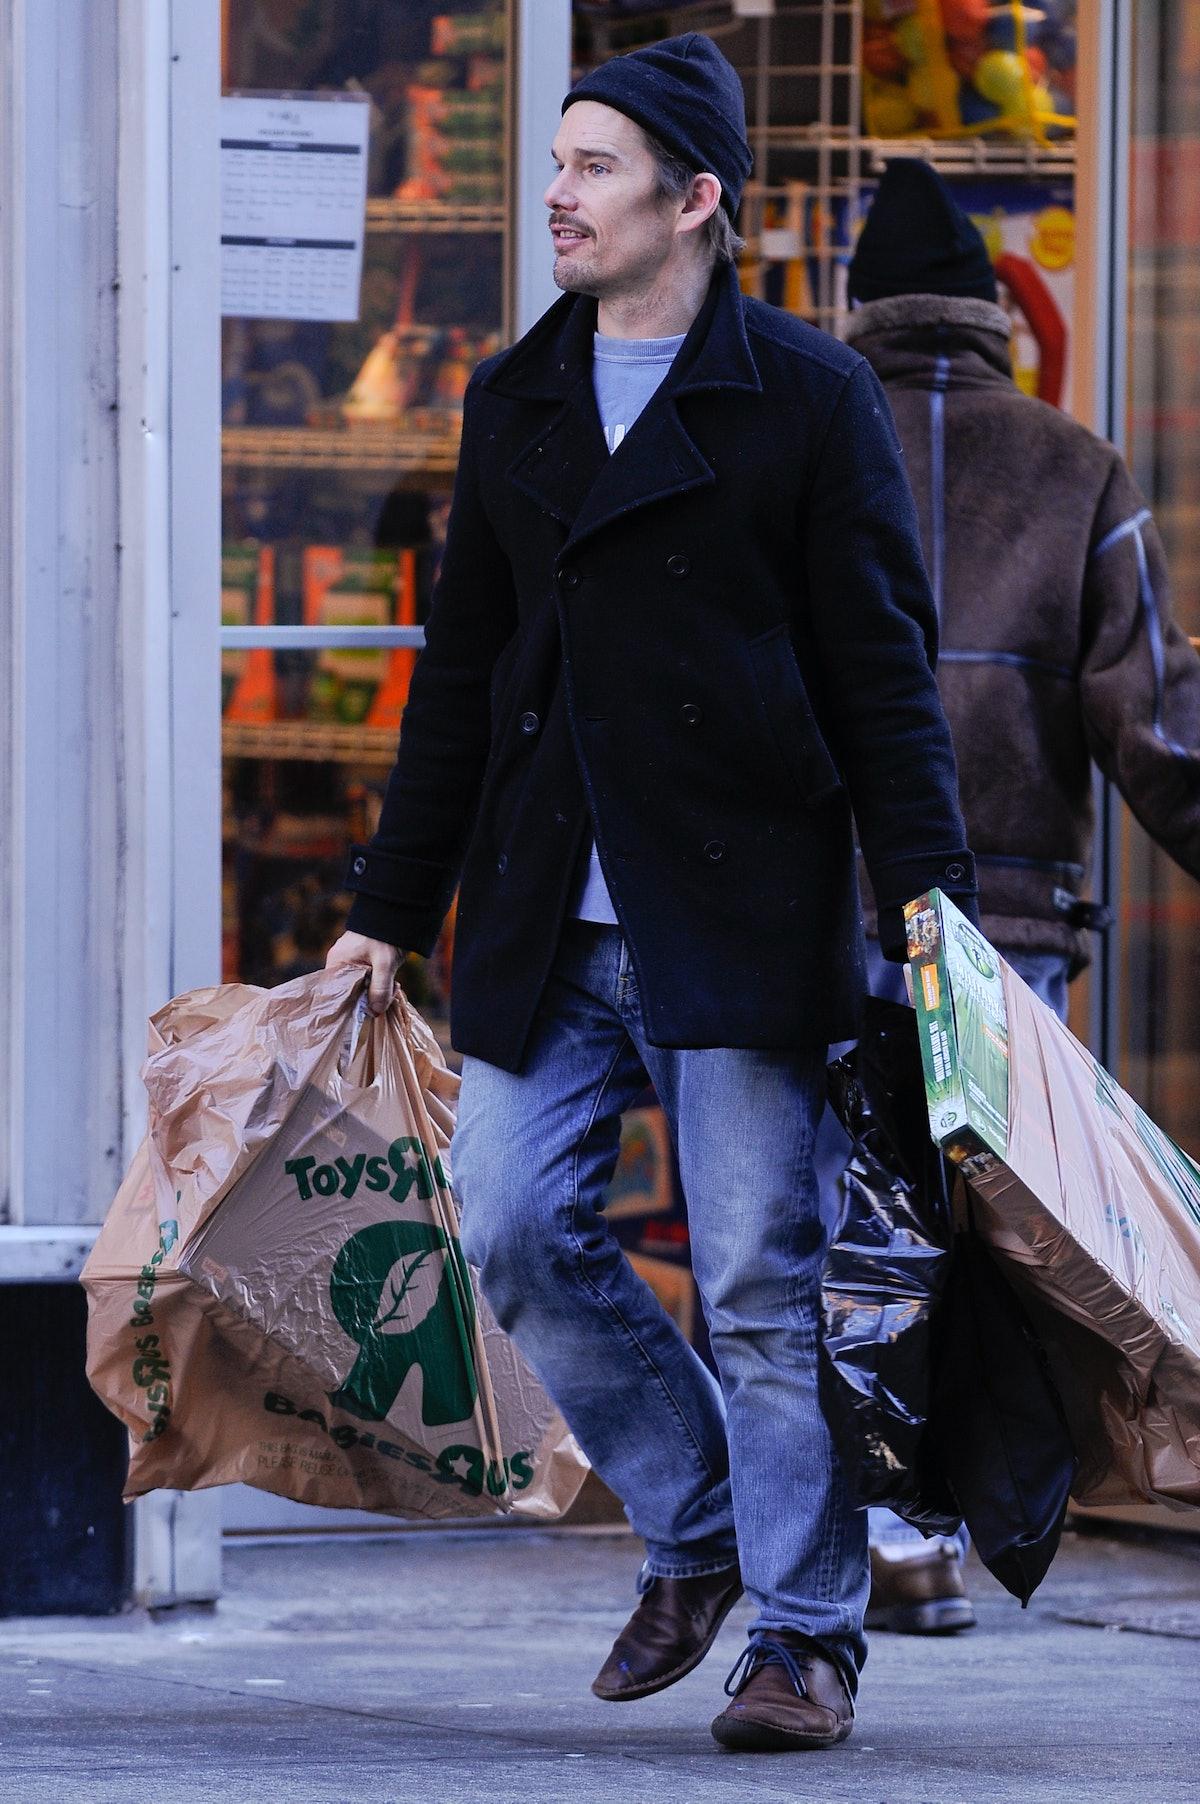 Celebrity Sightings In New York City - December 21, 2010